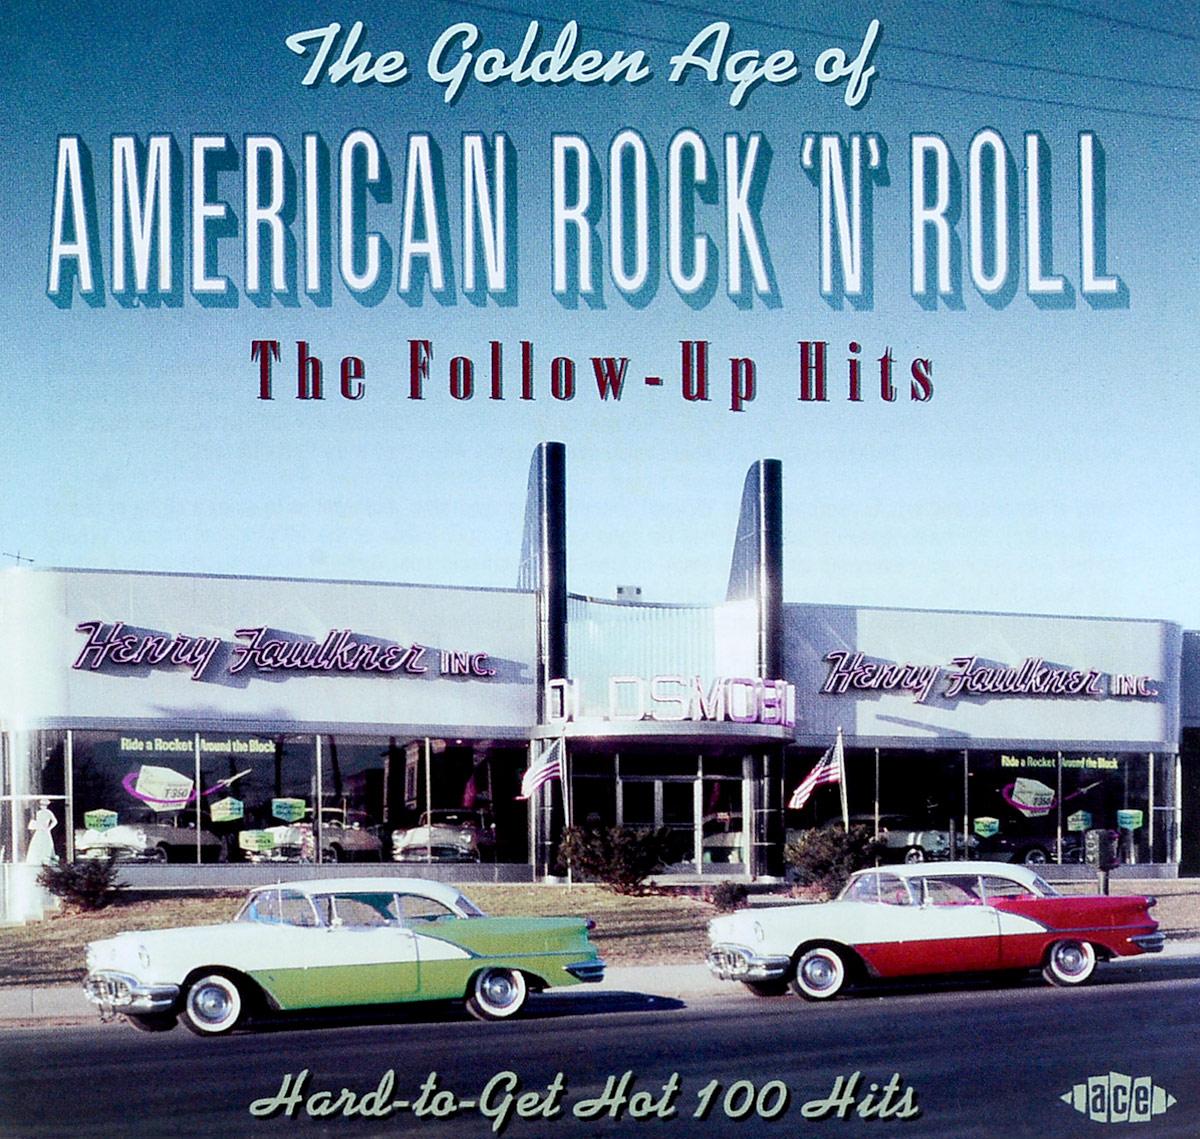 цены на The Golden Age Of American Rock'n'roll:The Follow-Up Hits  в интернет-магазинах